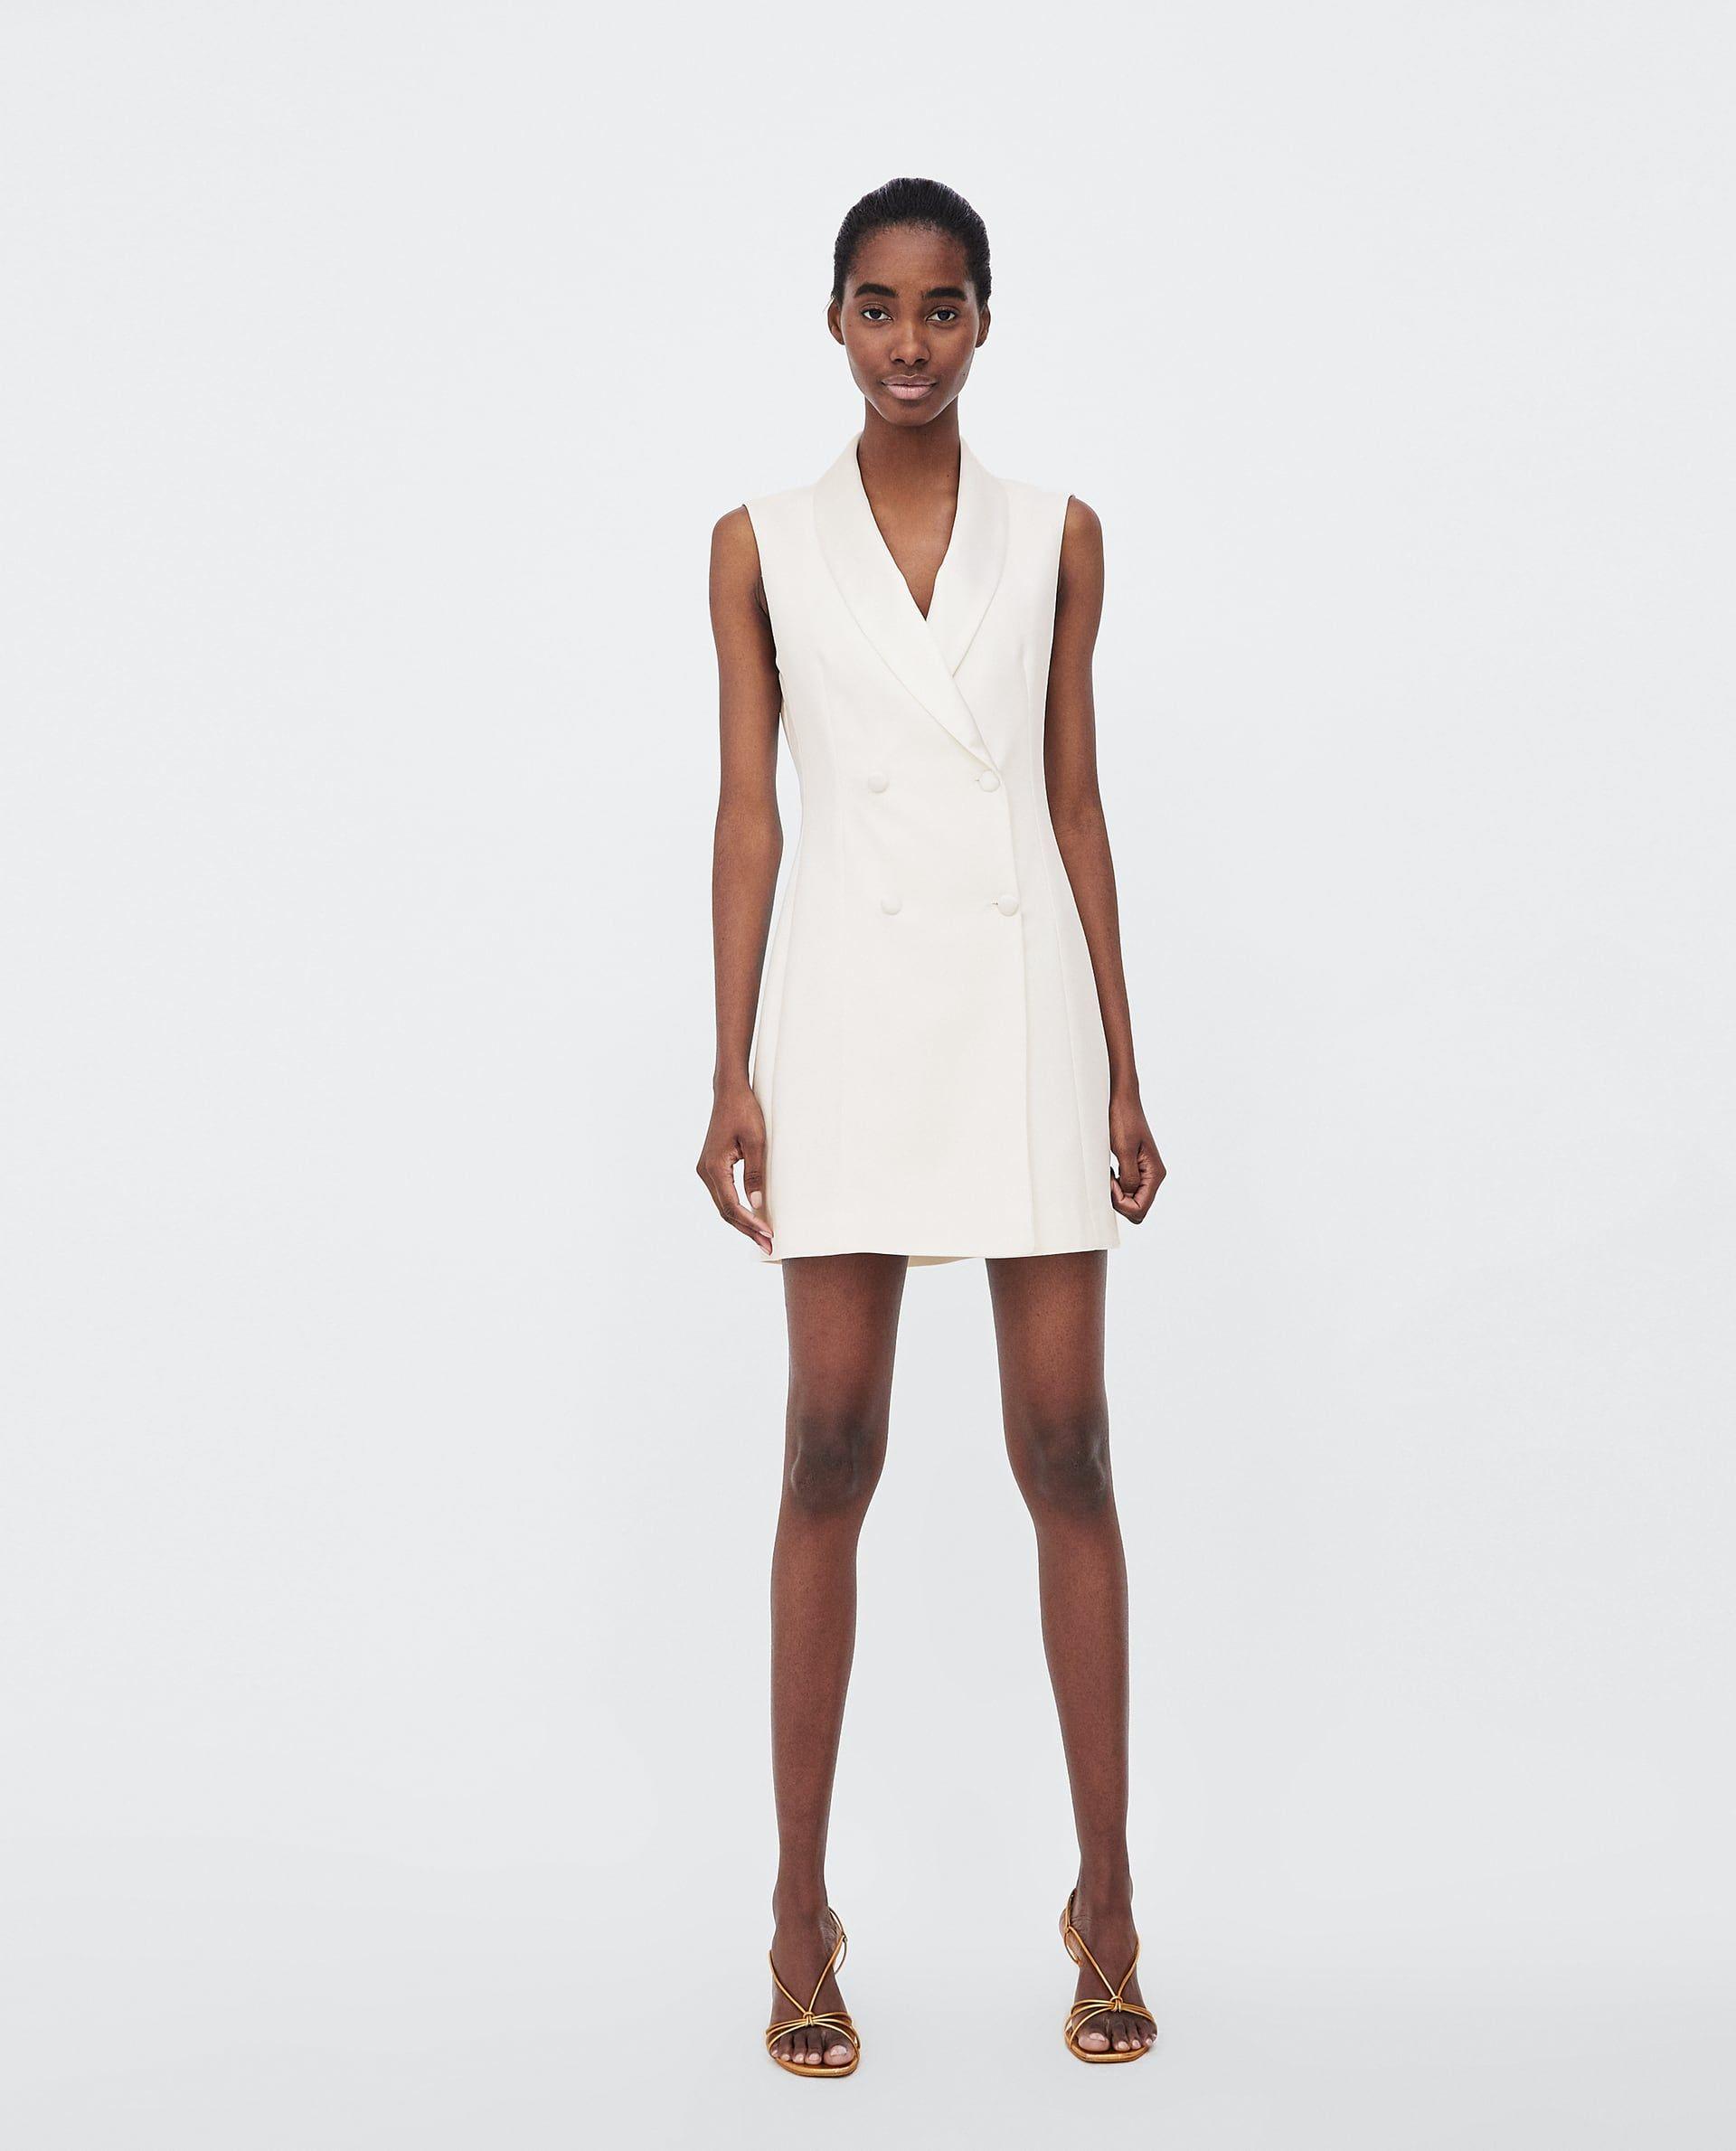 024d80ef Tuxedo dress vest in 2019 | Fashion Passion | Tuxedo dress, Dresses ...